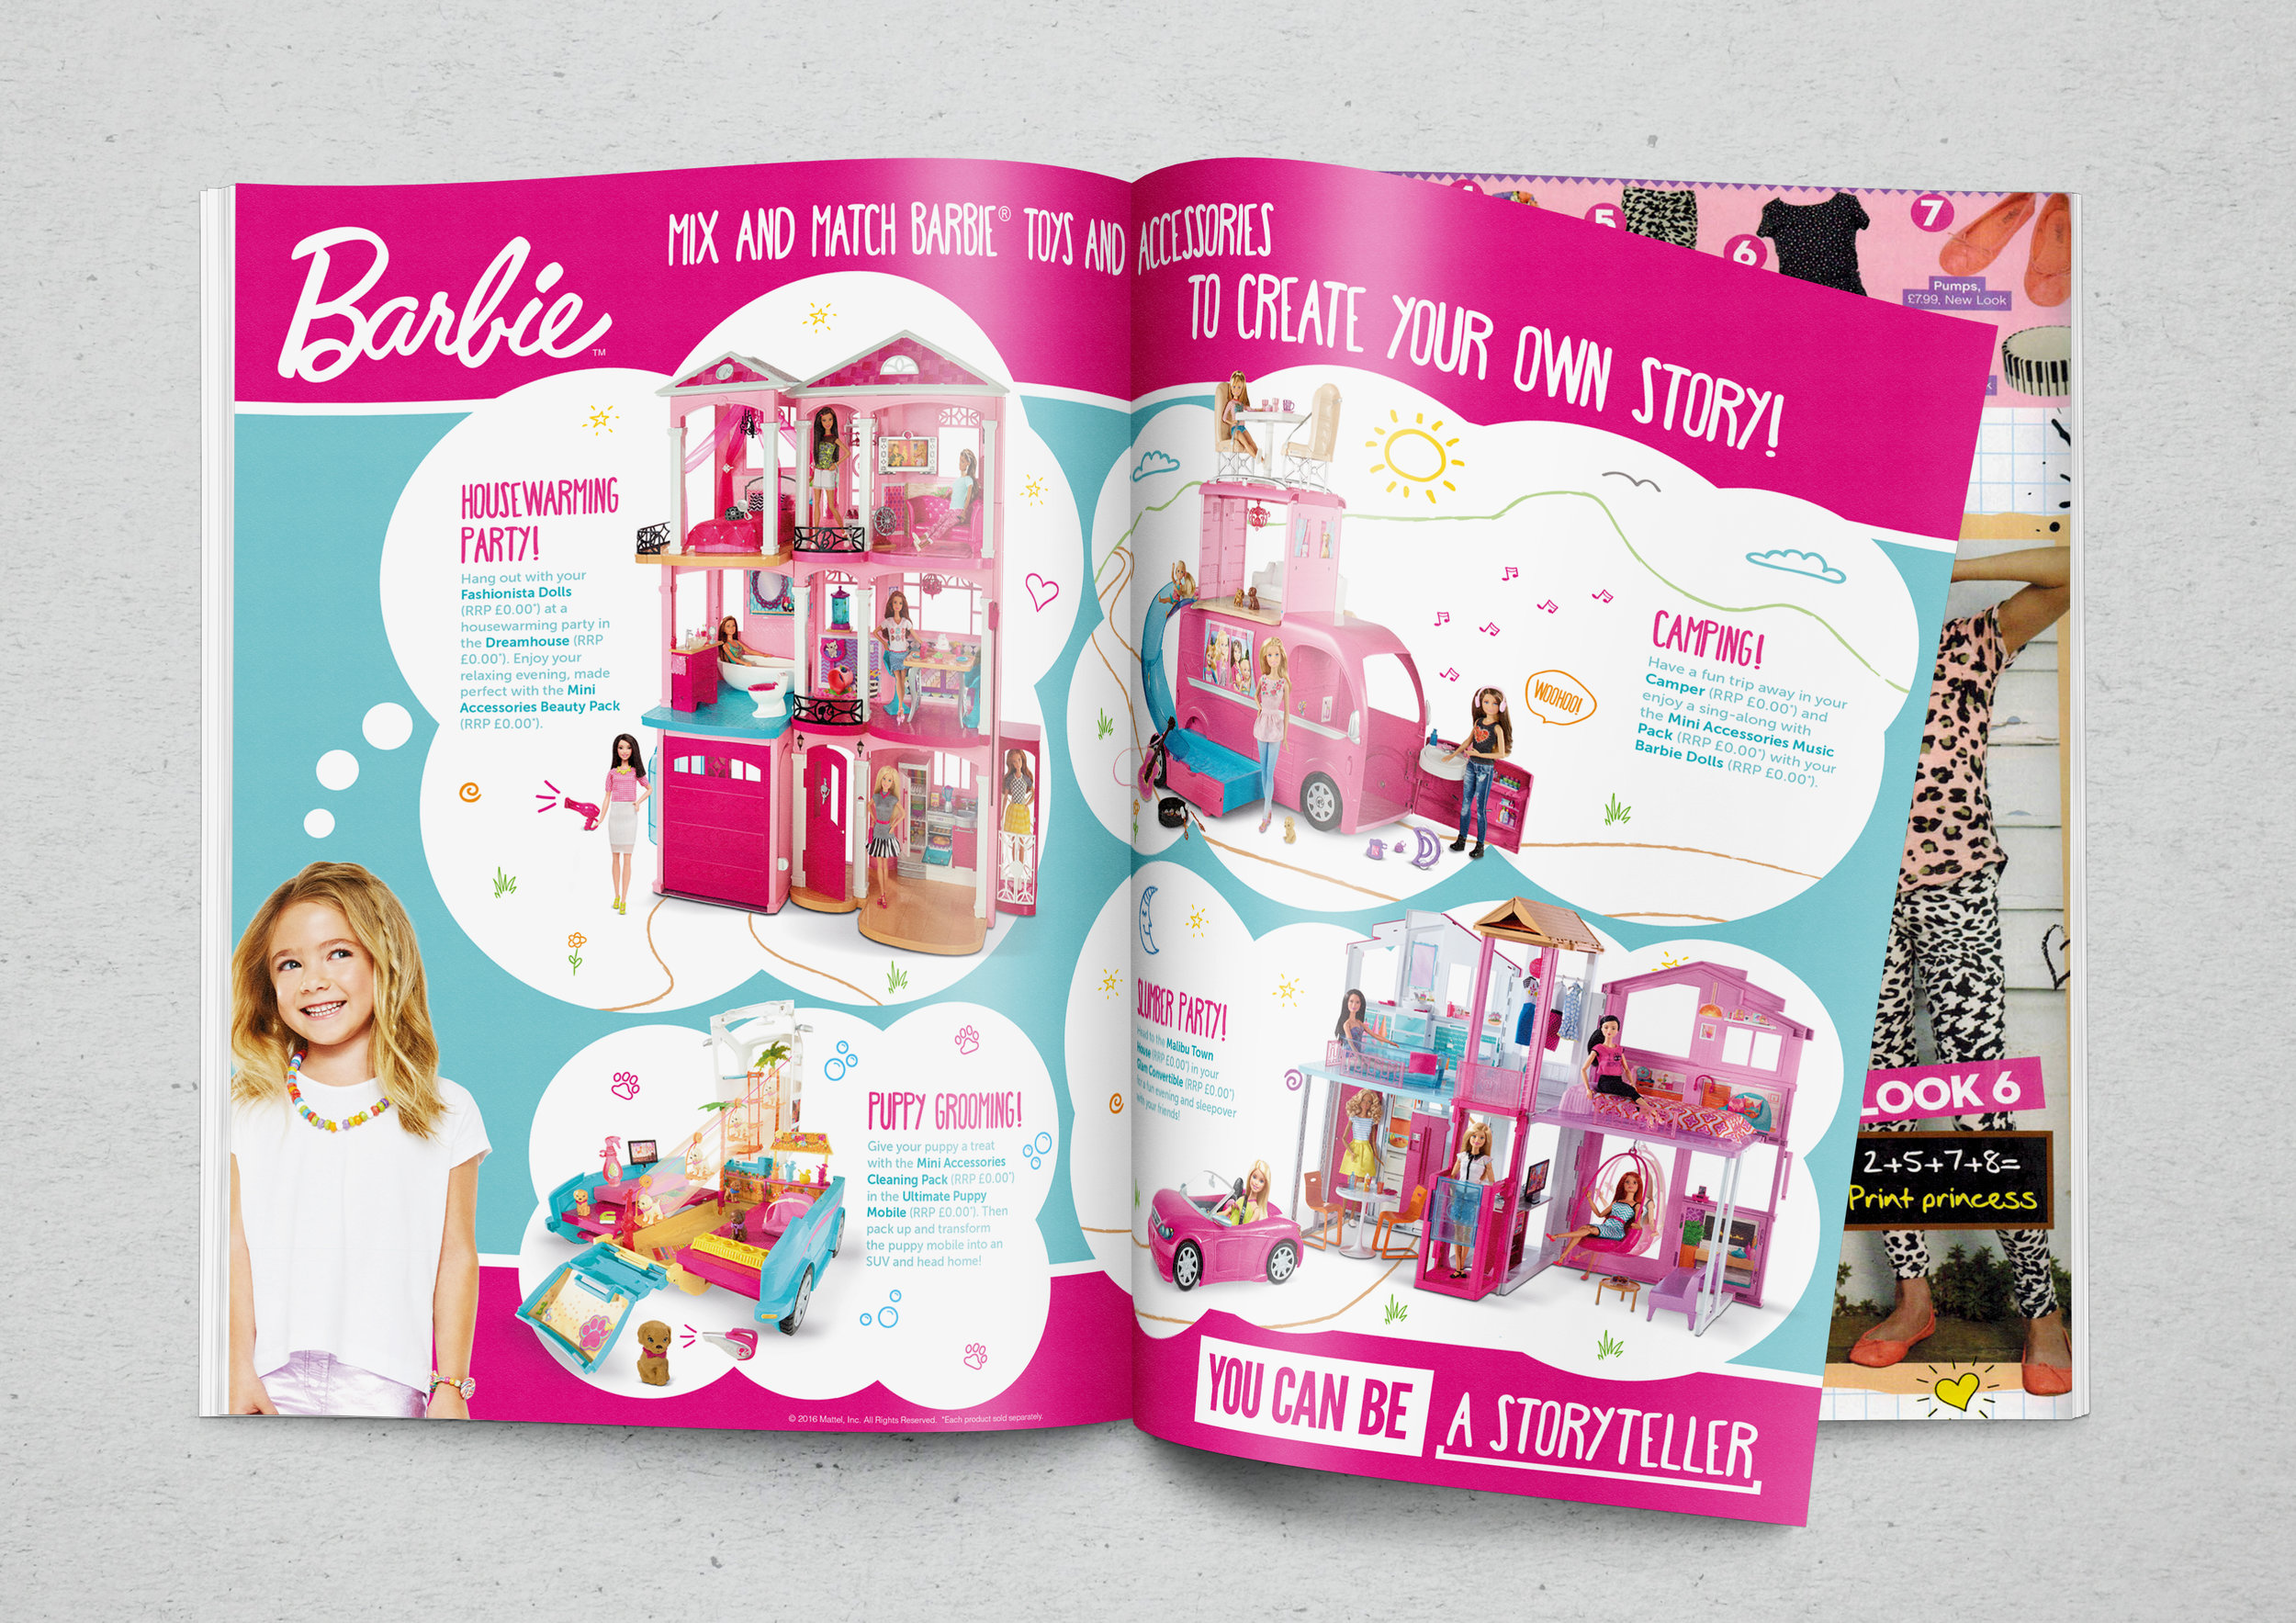 Barbie press mock up 1.jpg